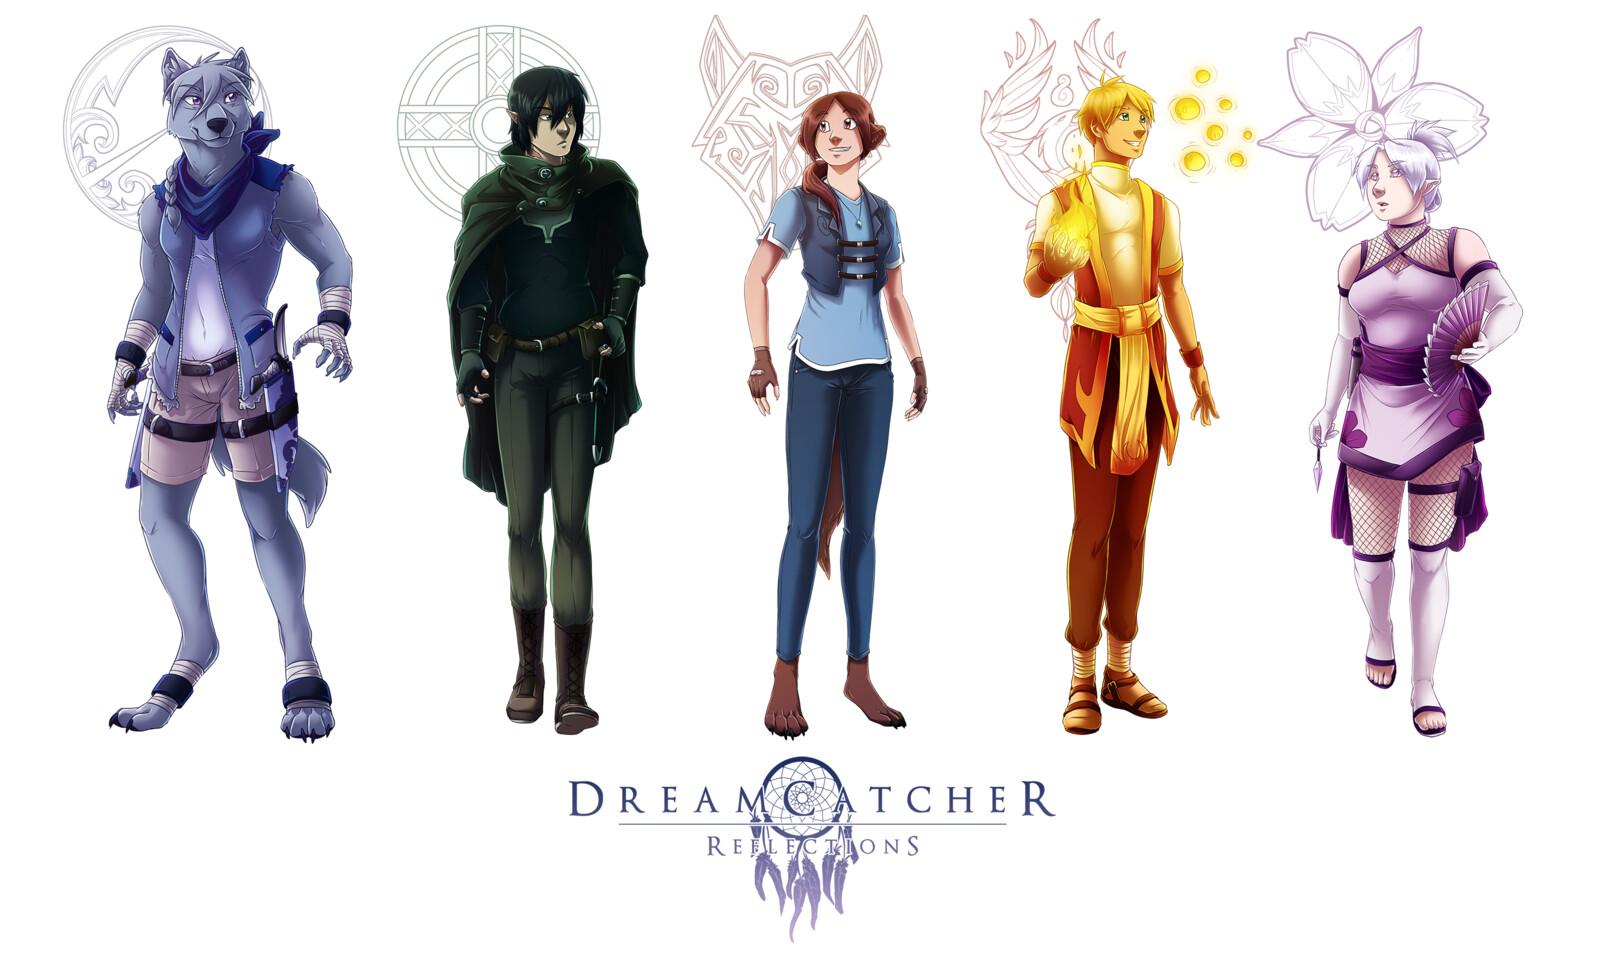 DreamCatcher: Reflections Character Designs